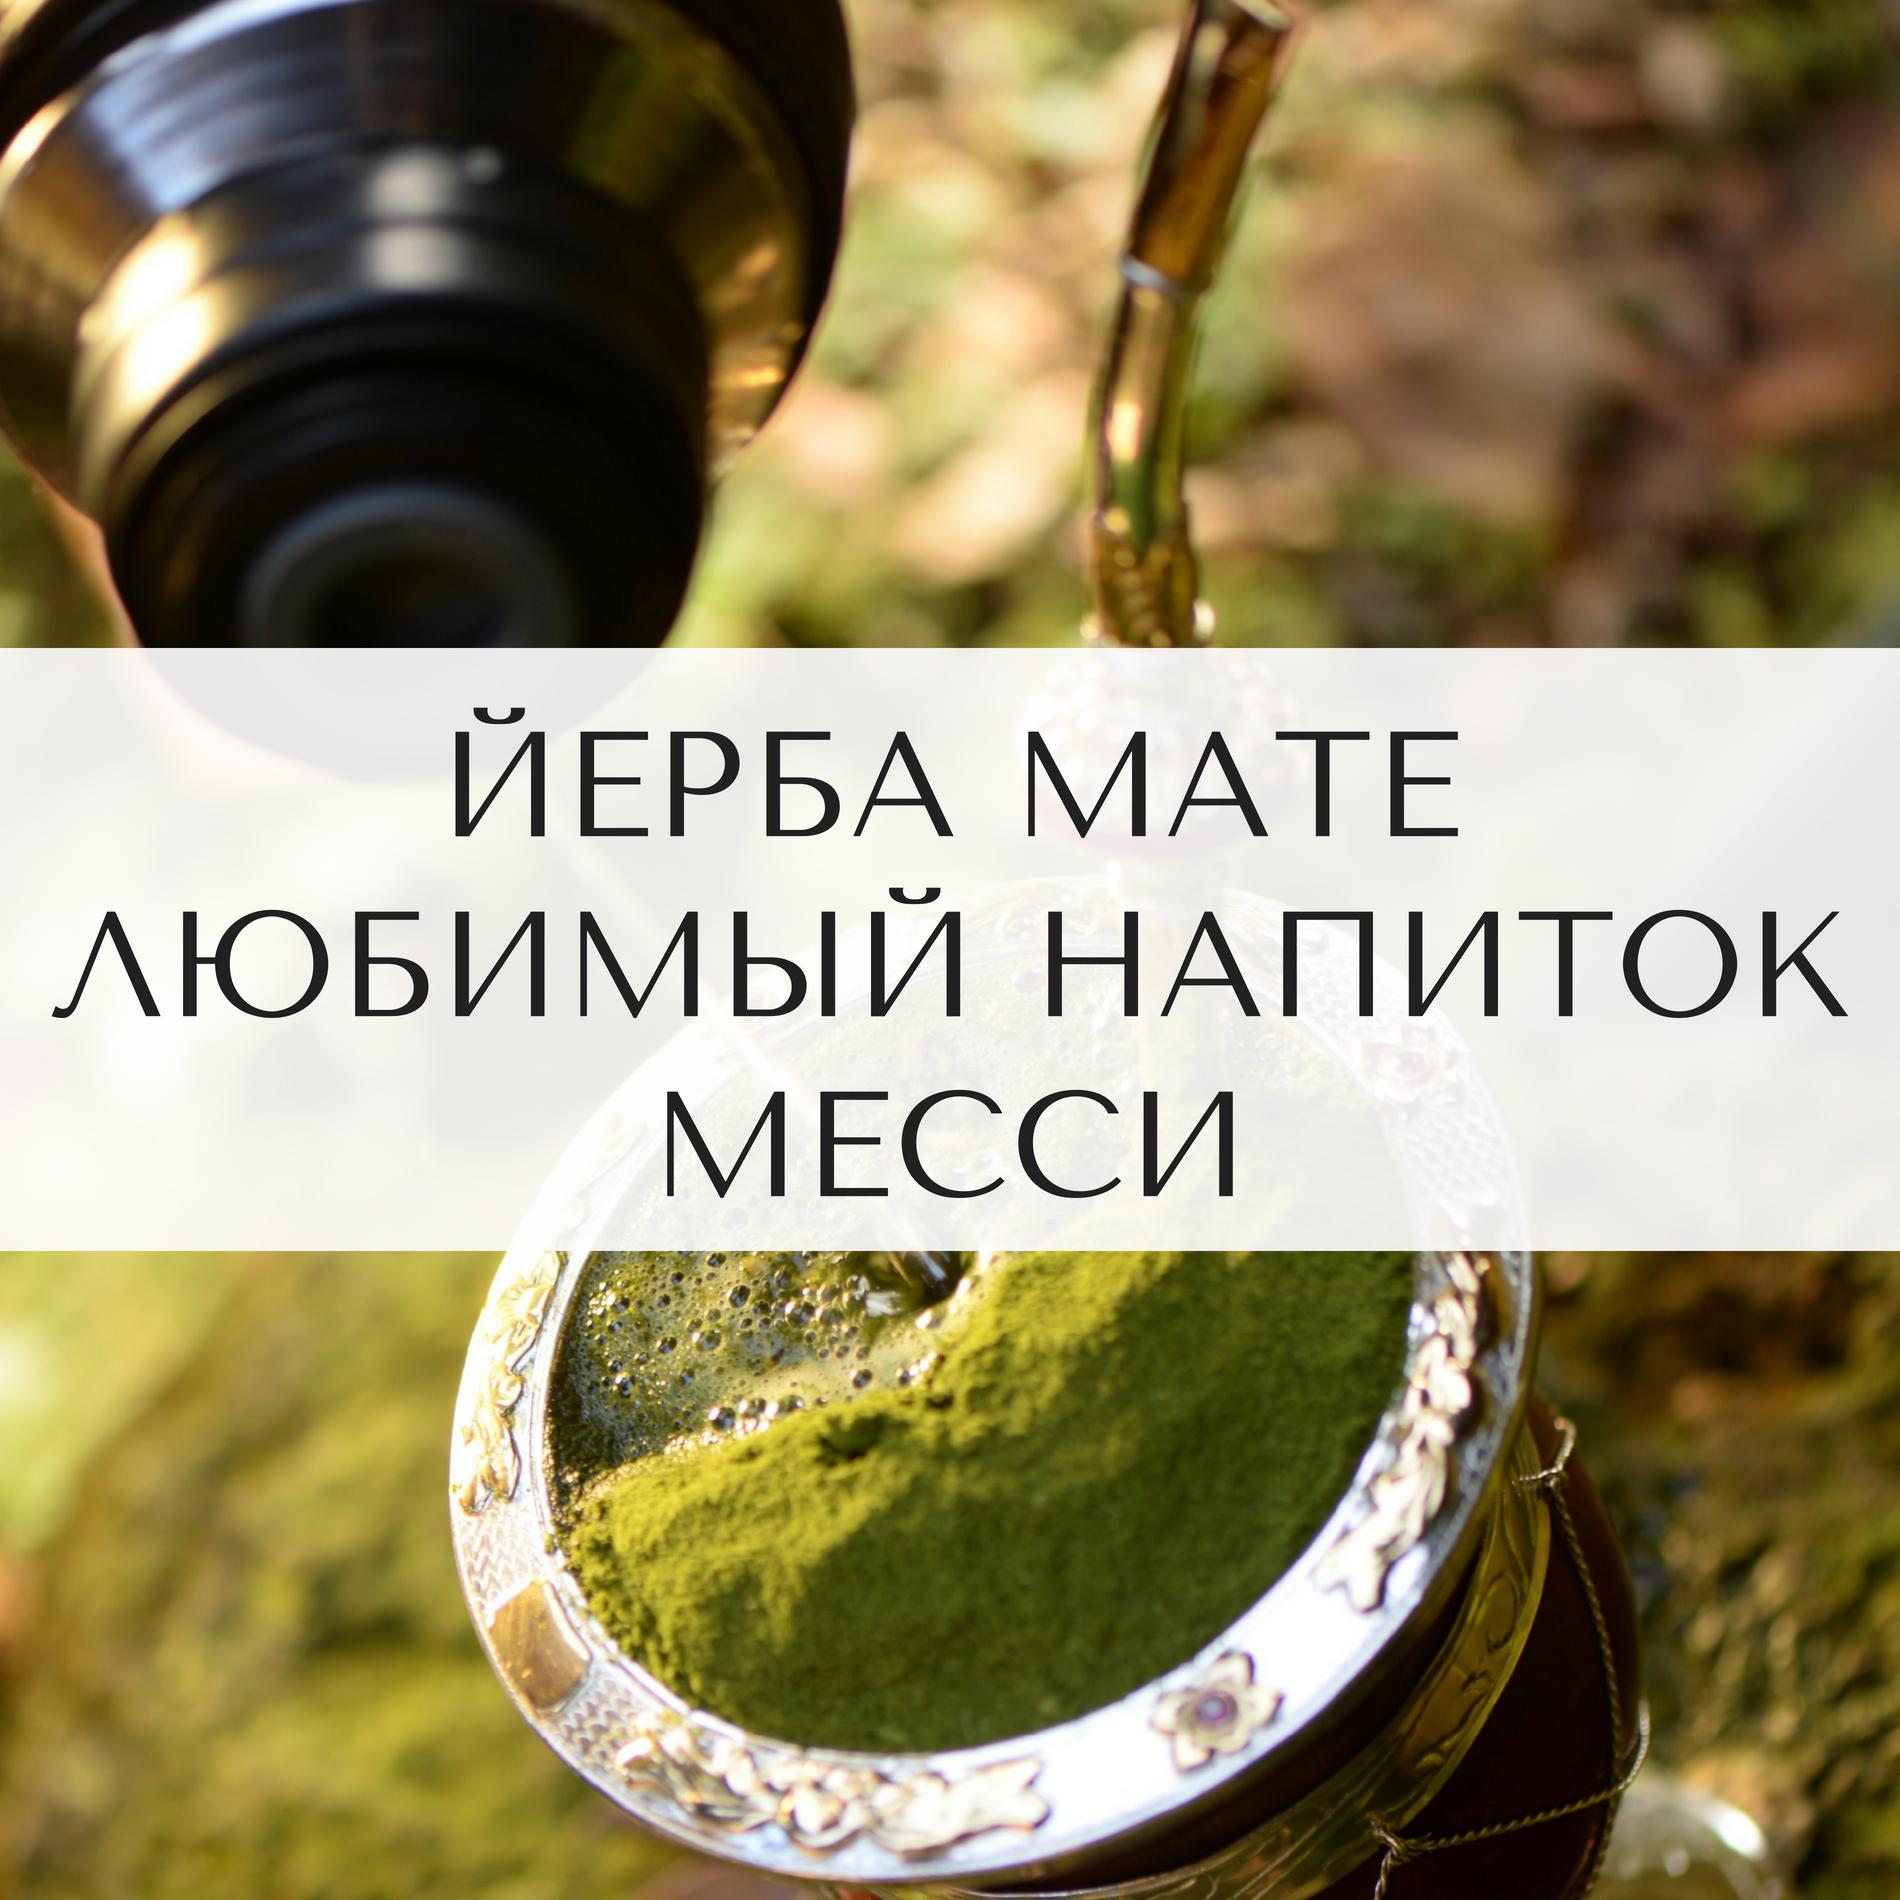 Мате: любимый напиток Месси, Марадоны и Мадонны